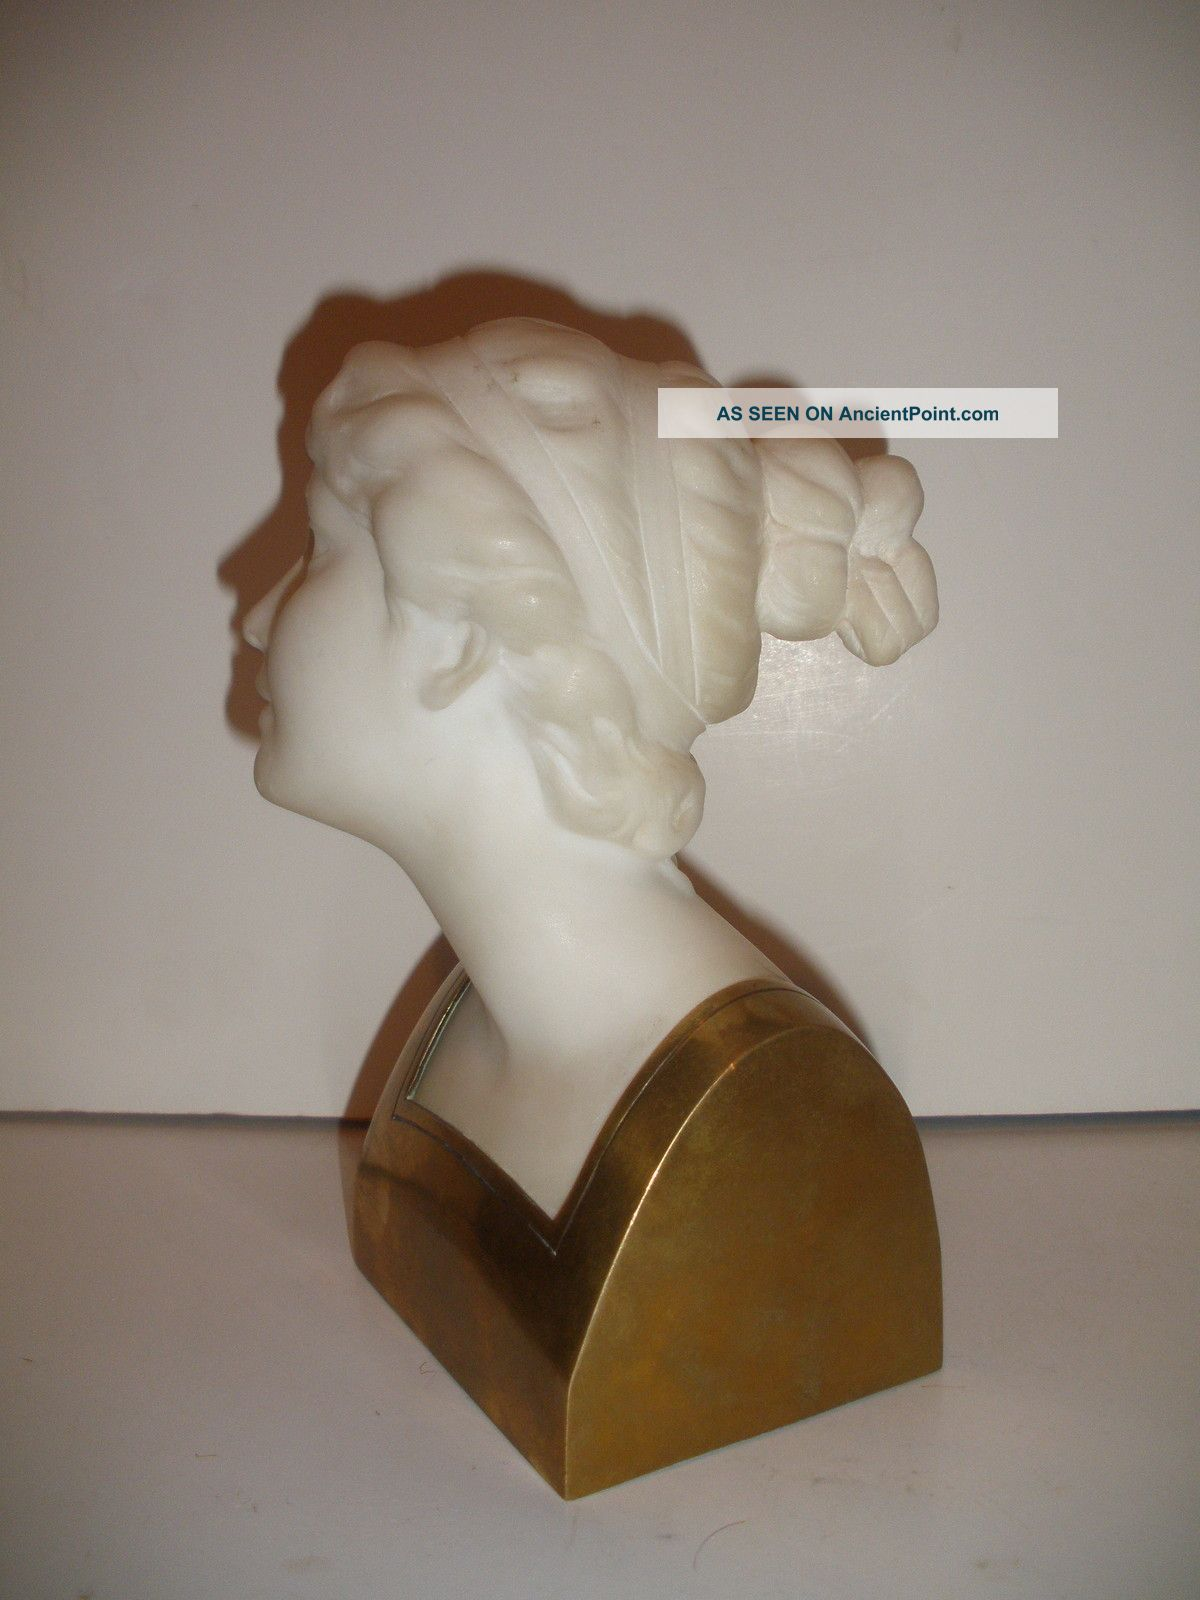 Antique Alabaster Marble Bronze Bust Of Young Lady Woman Sculpture By Schumacher Art Nouveau photo